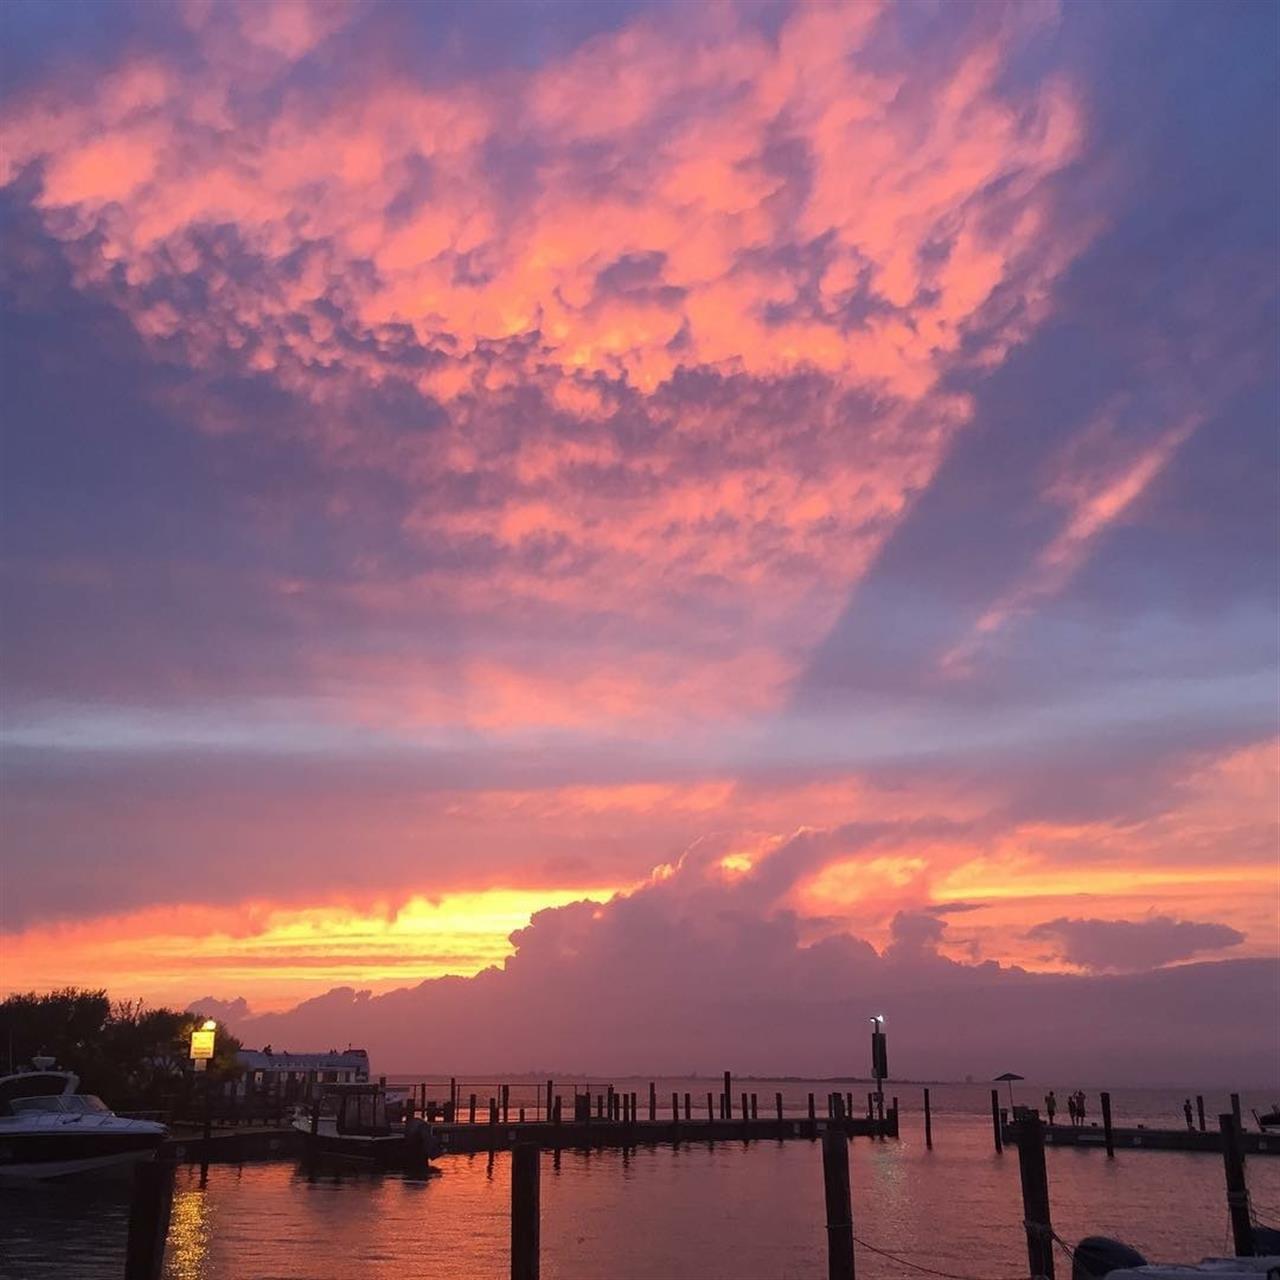 #LongIsland #FireIsland #Sunsets